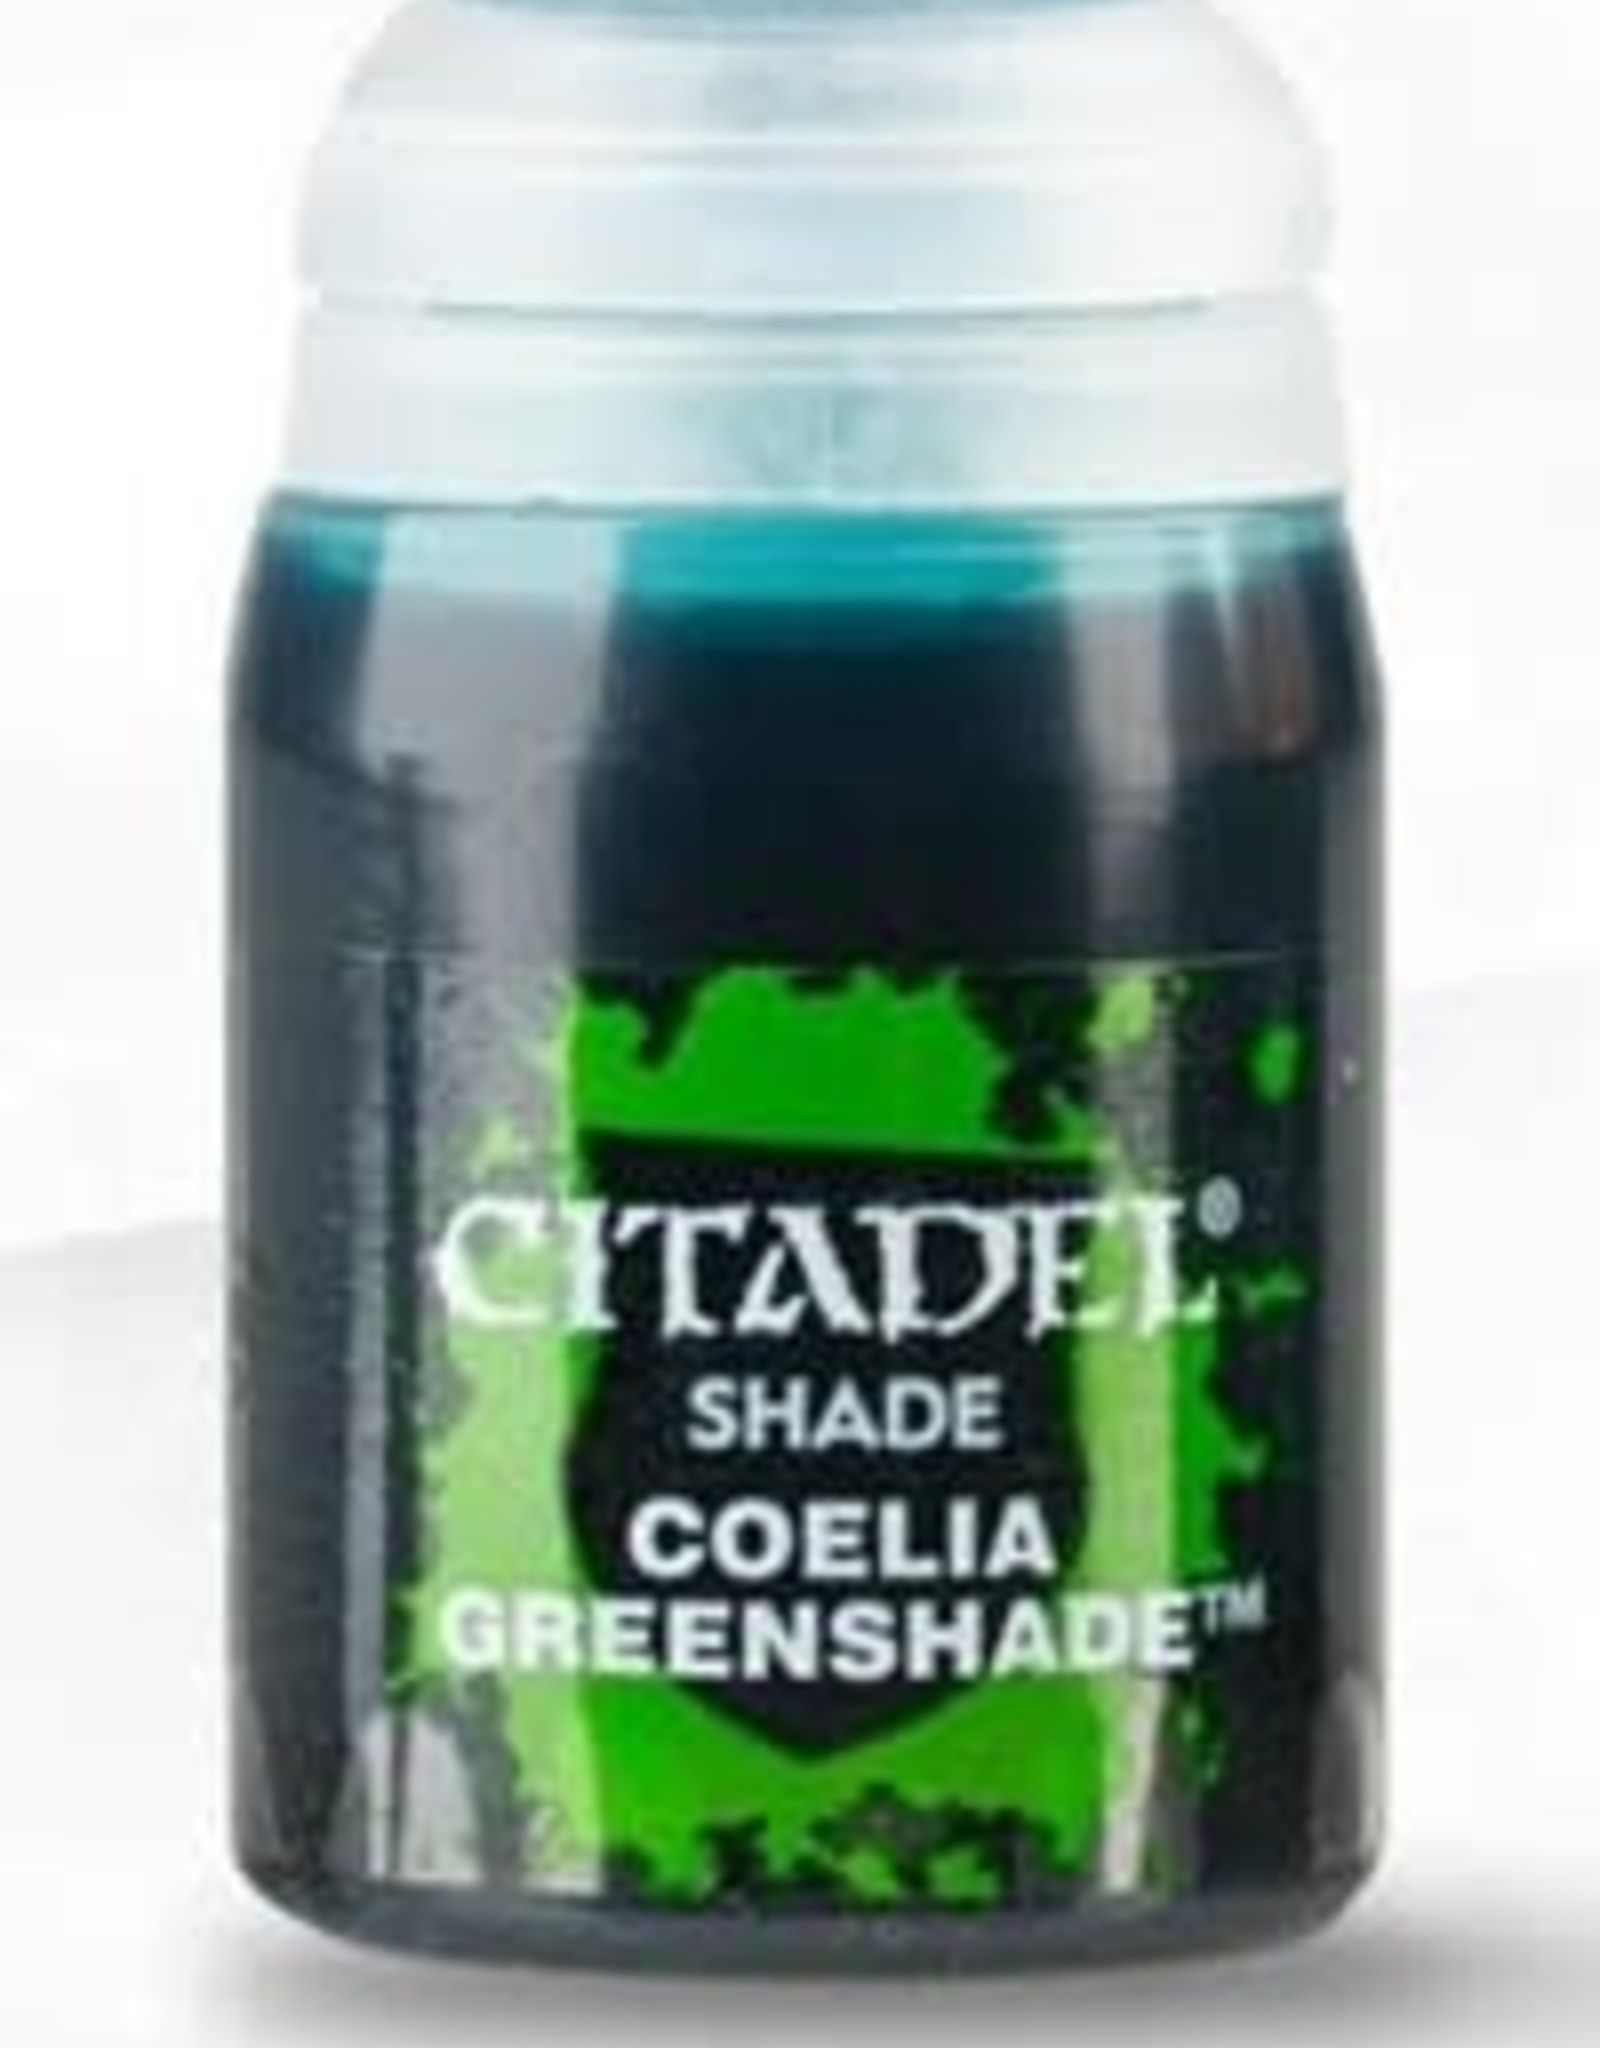 Games Workshop Citadel Paint: Shade - Coelia Greenshade 24ml